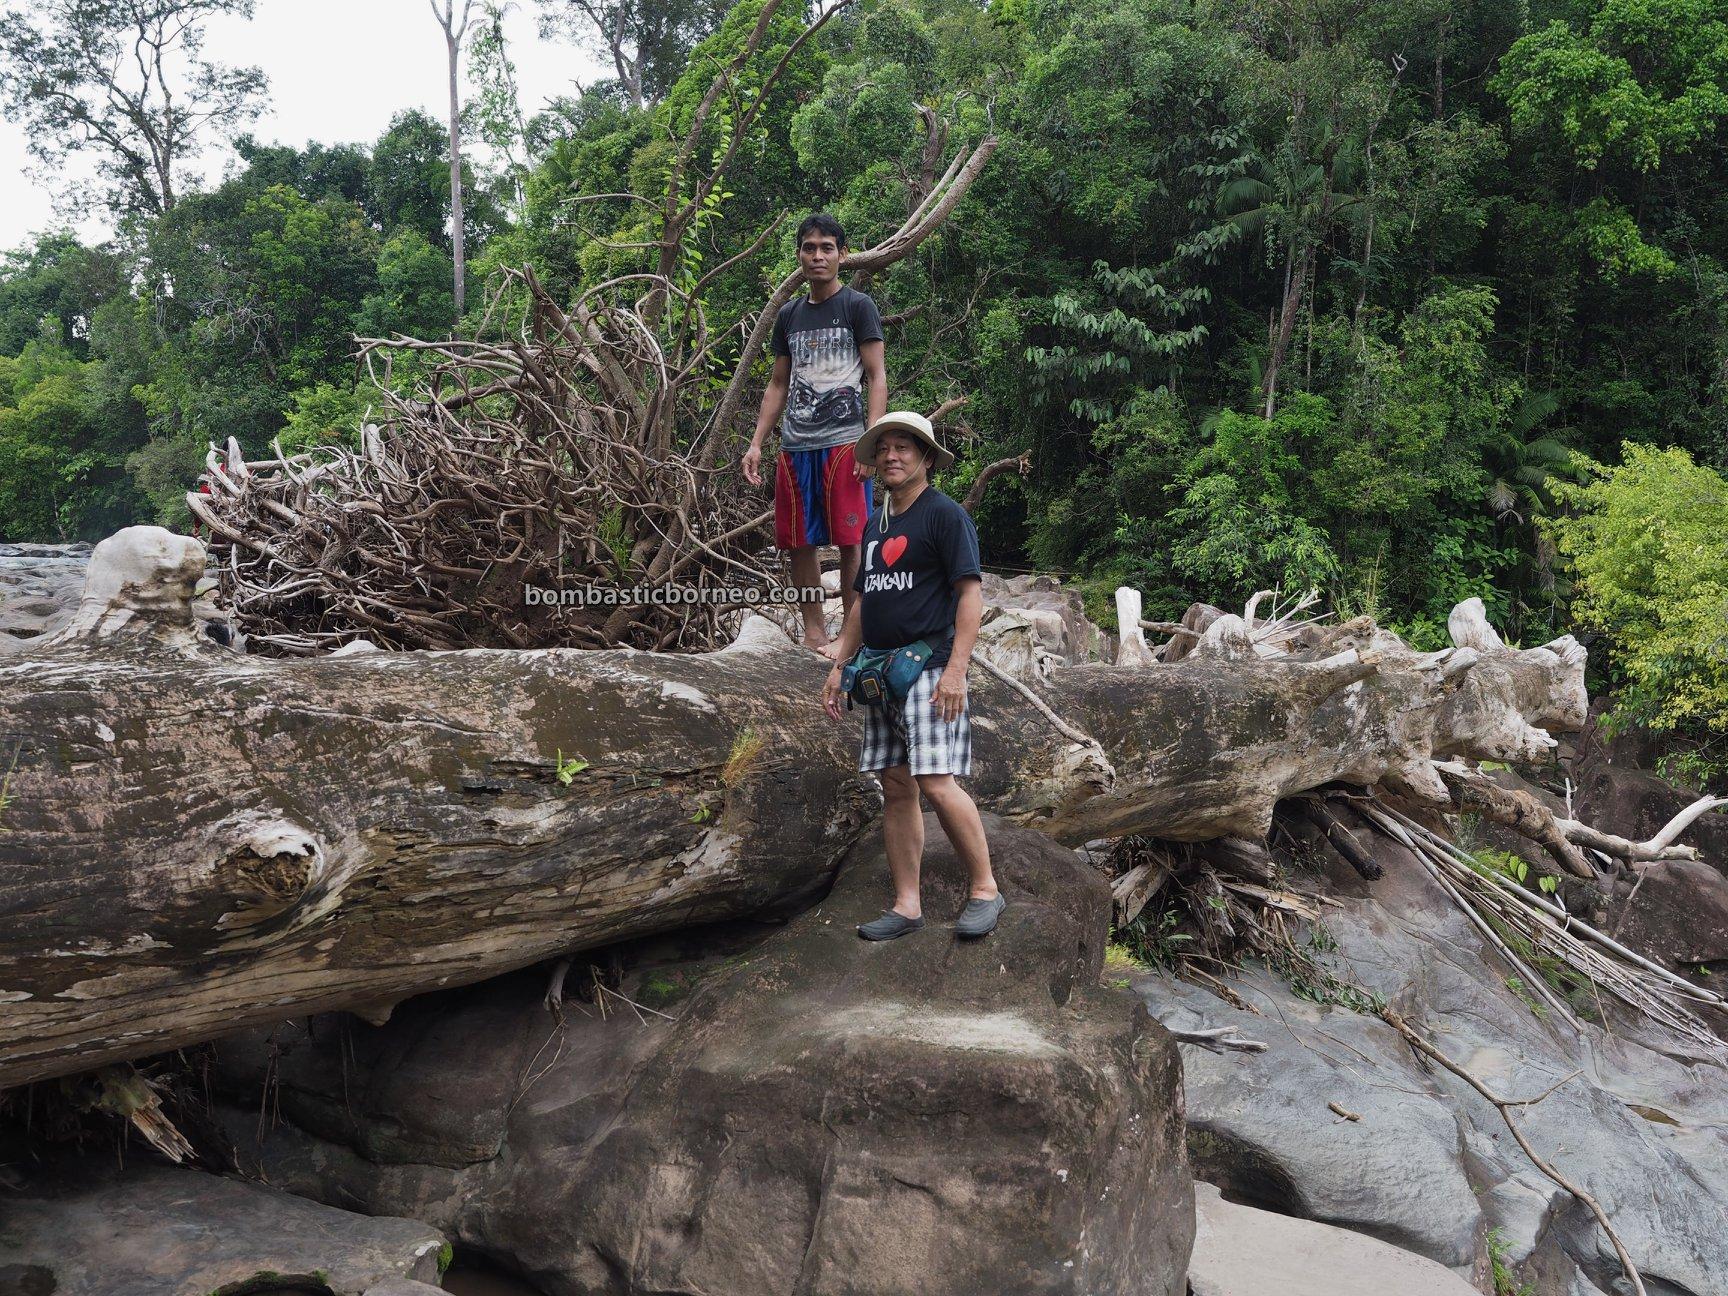 Waterfall, adventure, nature, outdoor, exploration, Indonesia, West Kalimantan, Desa Bengkawan, Seluas, Tourism, native, village, Borneo, 印尼西加里曼丹, 孟加映瀑布,